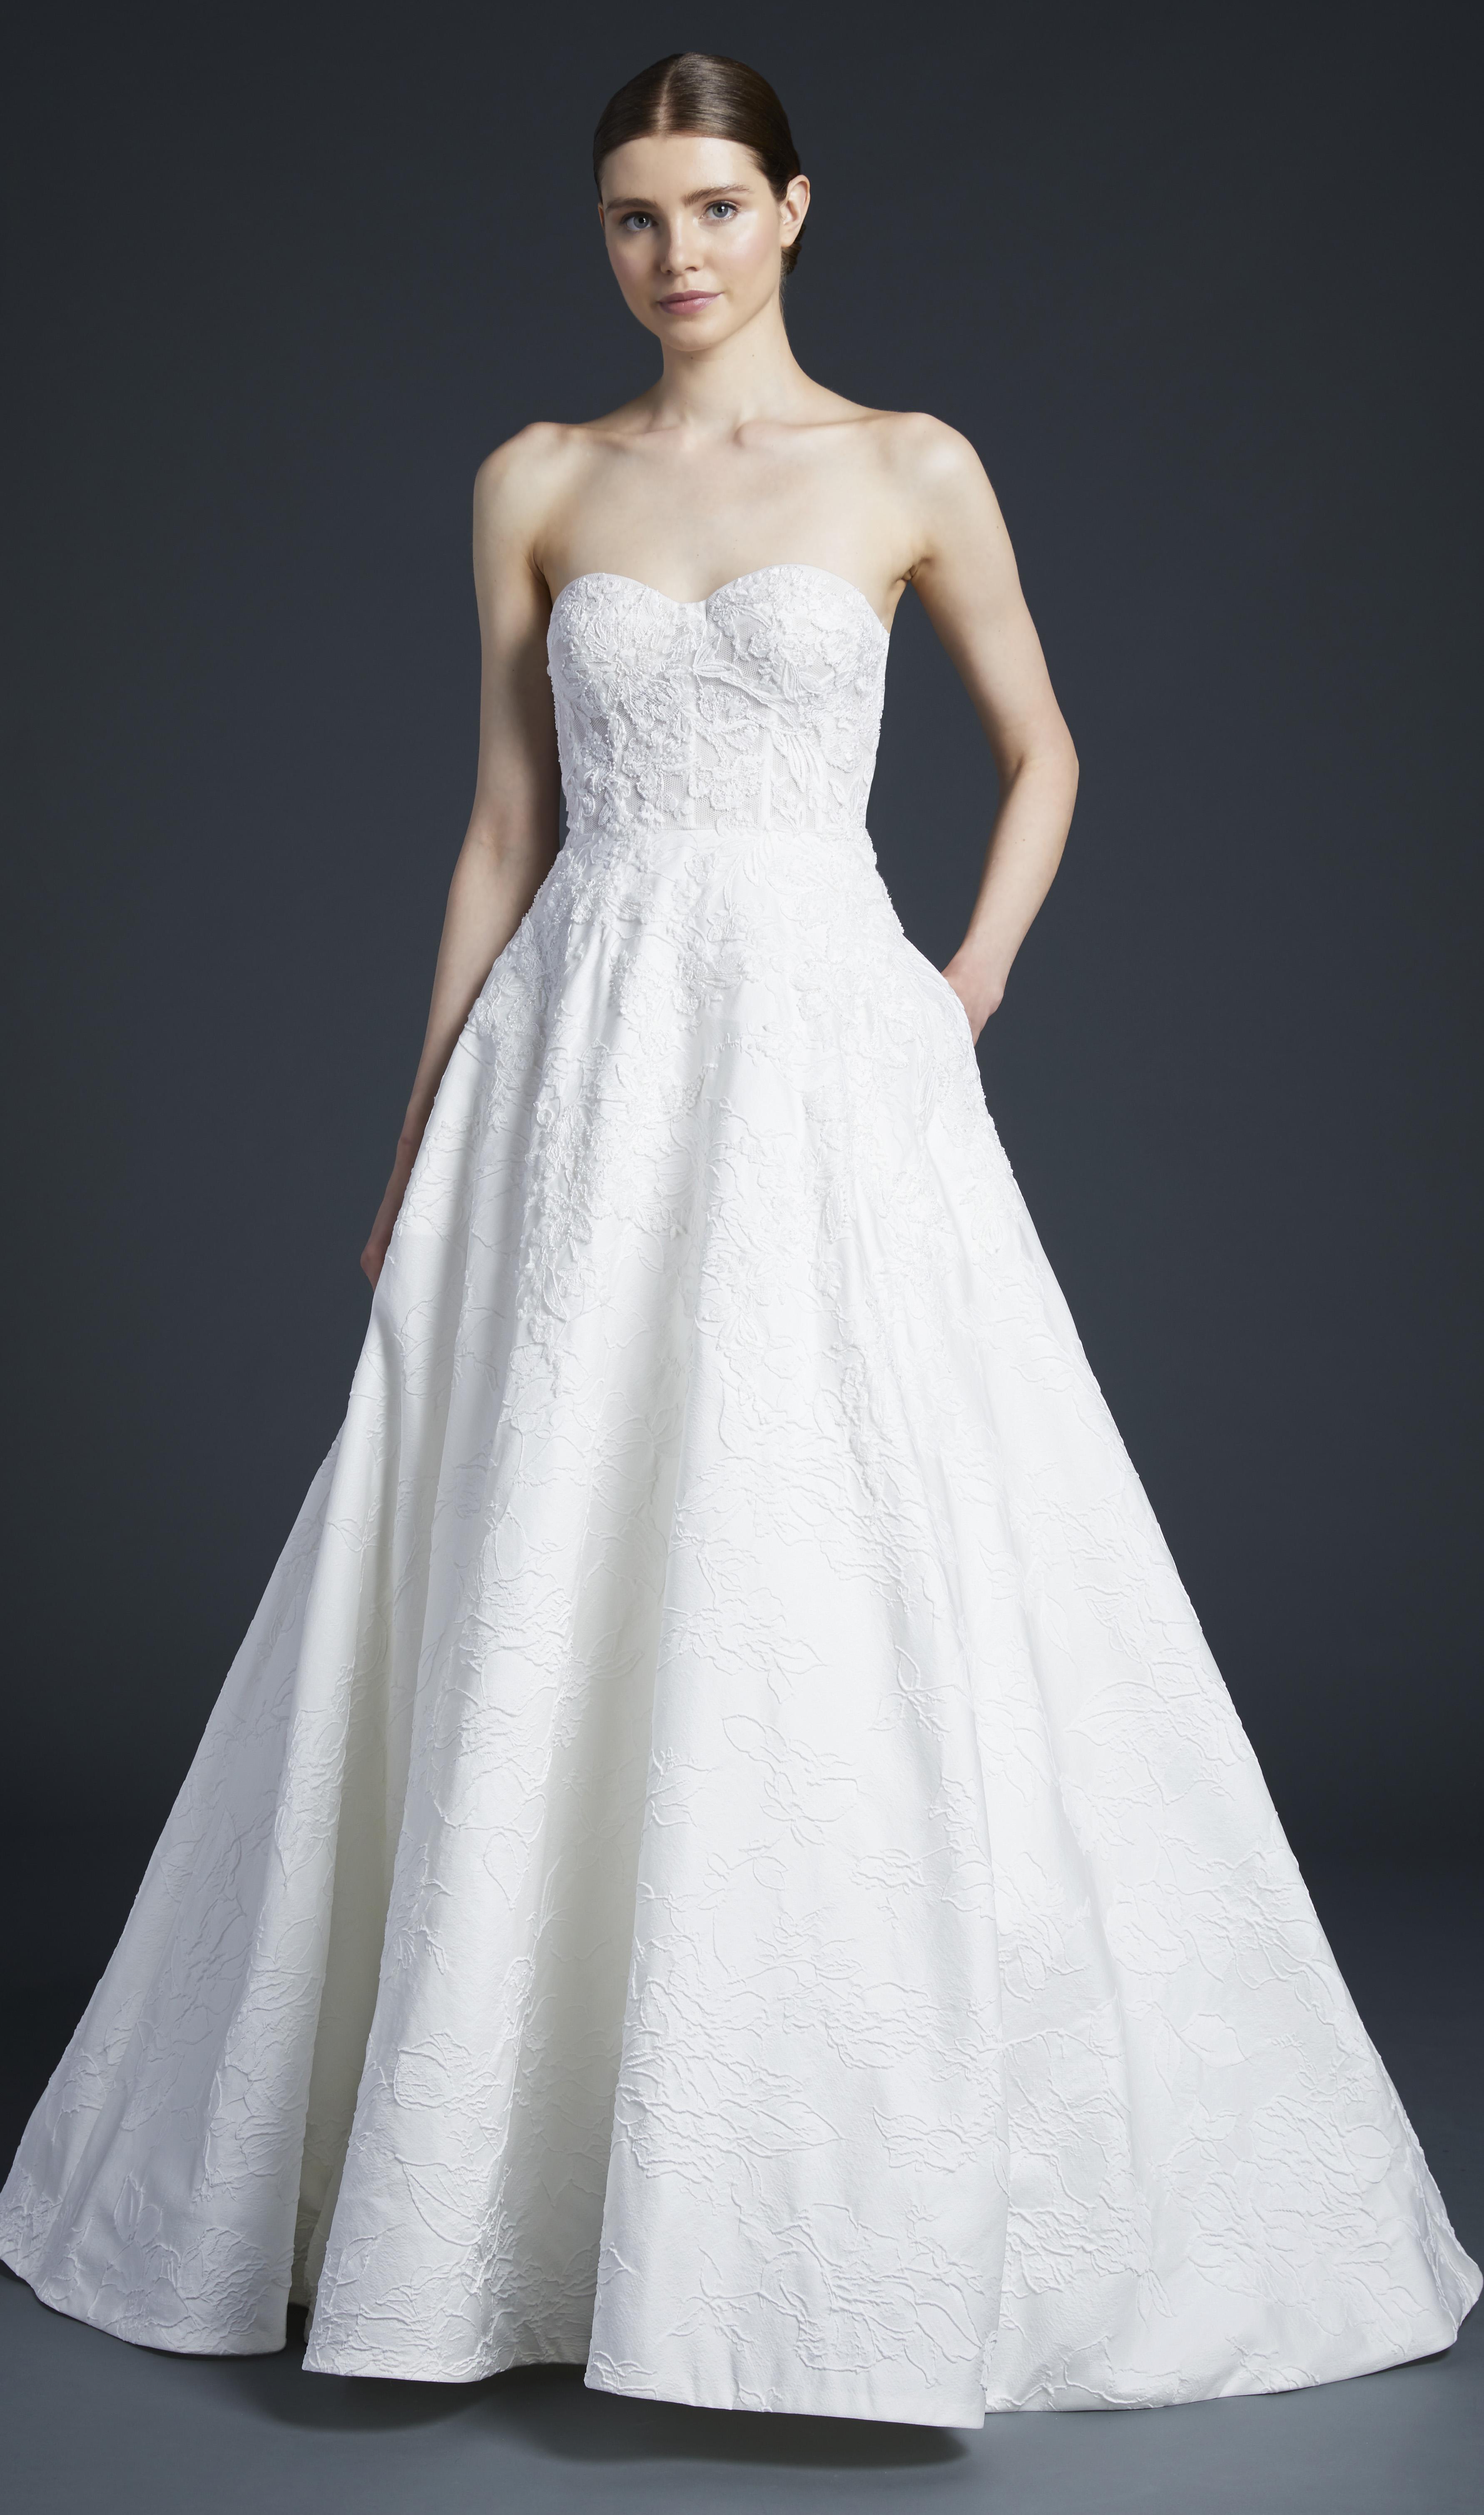 anne barge patterned sweetheart wedding dress fall 2019